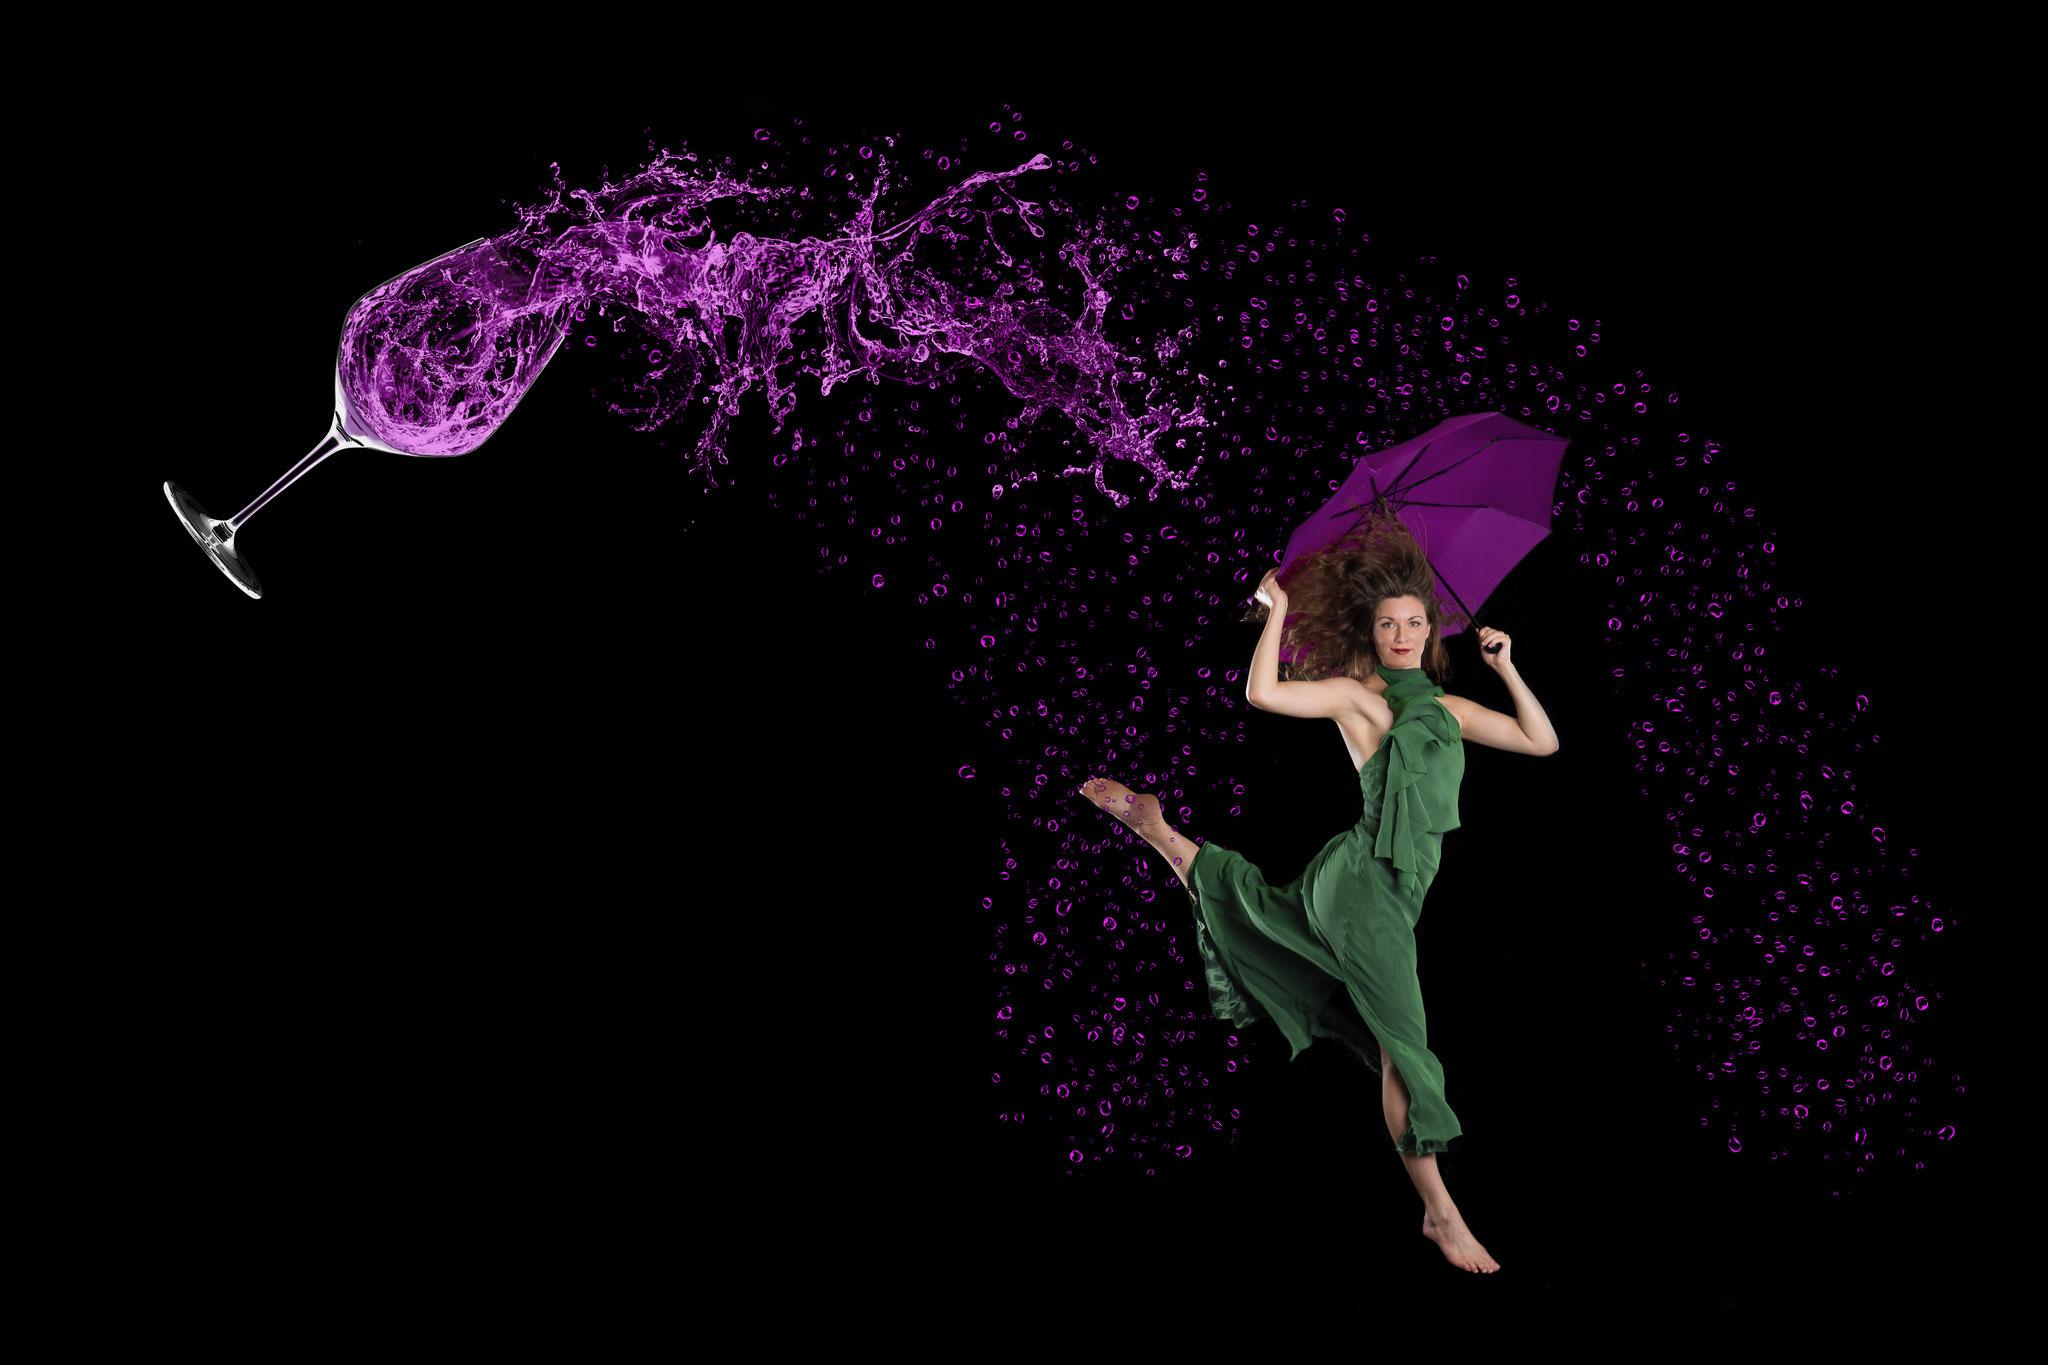 Purple Rain (Prince, 1984)